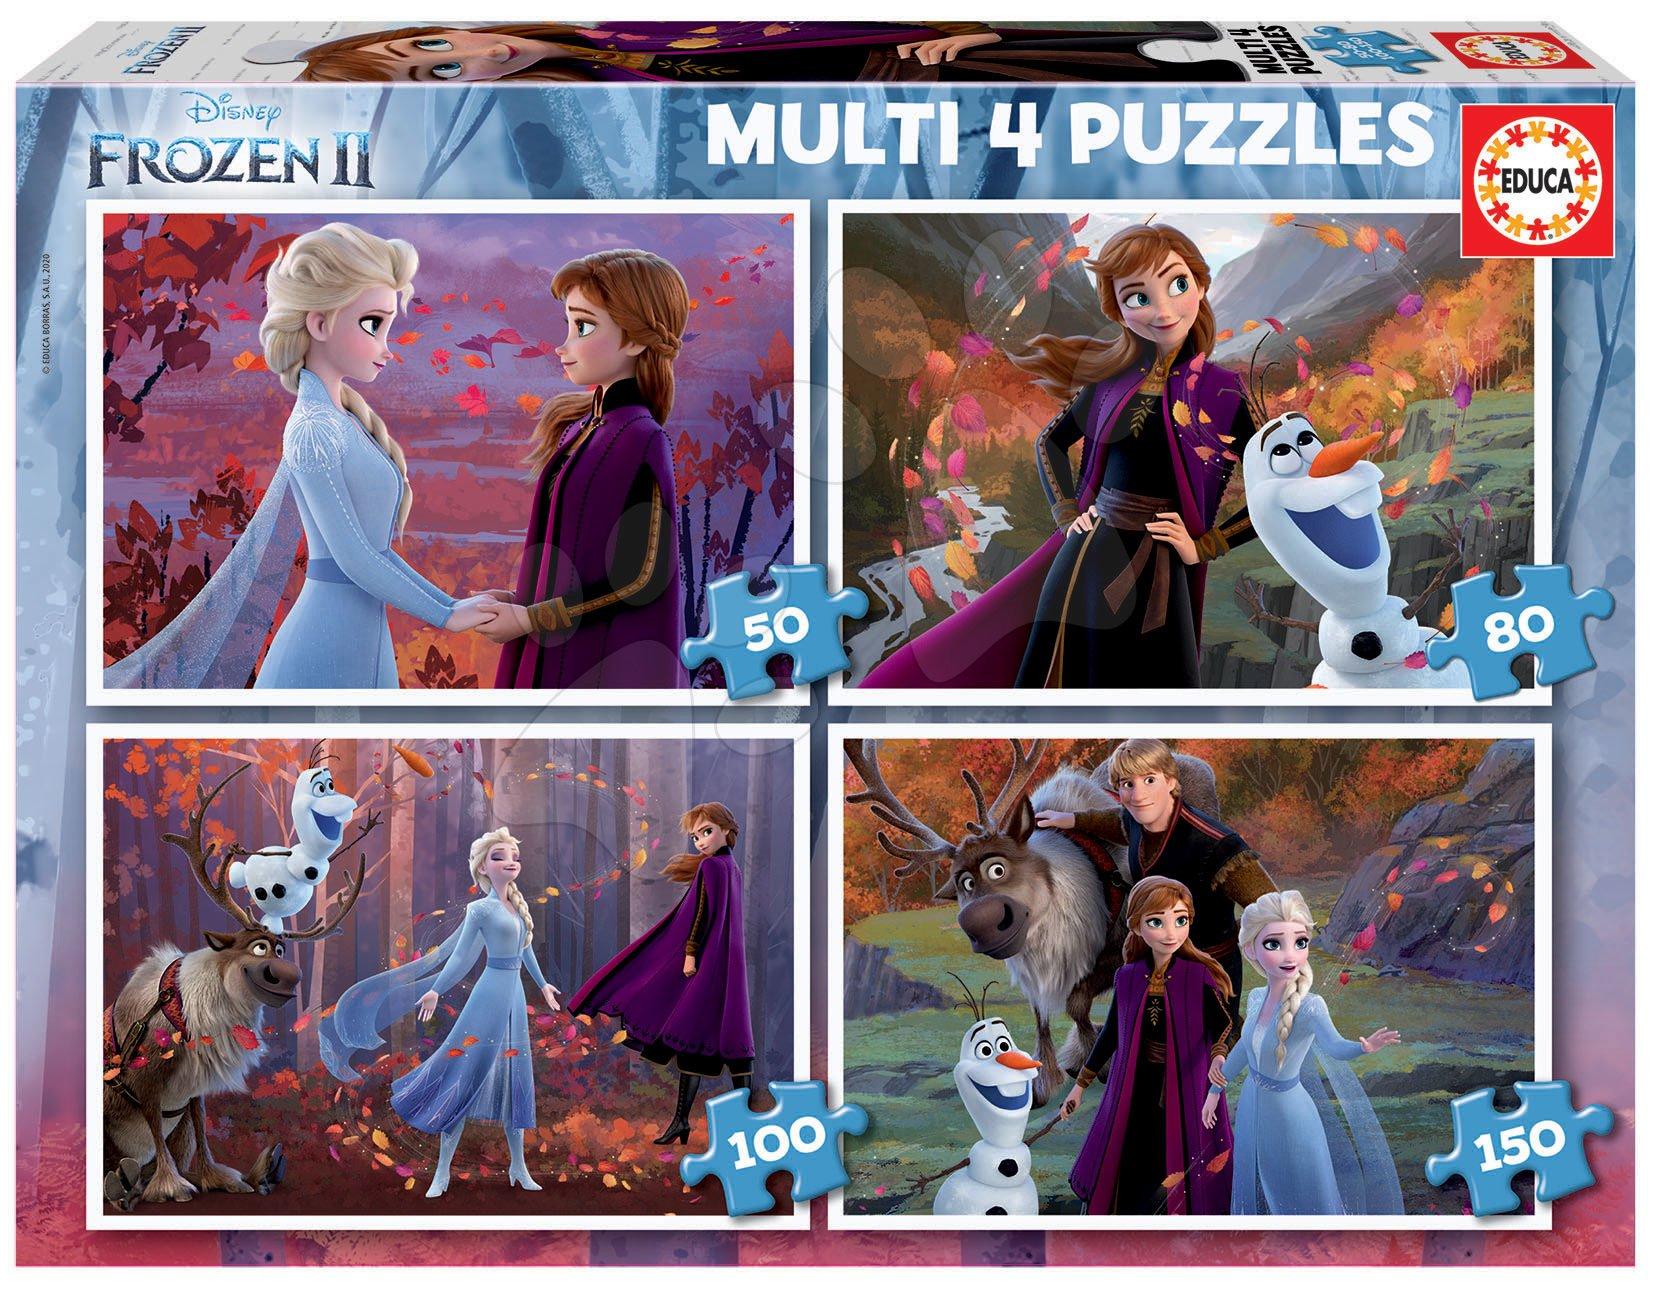 Puzzle Multi 4 Frozen 2 Disney Educa 50-80-100-150 dílků od 5 let